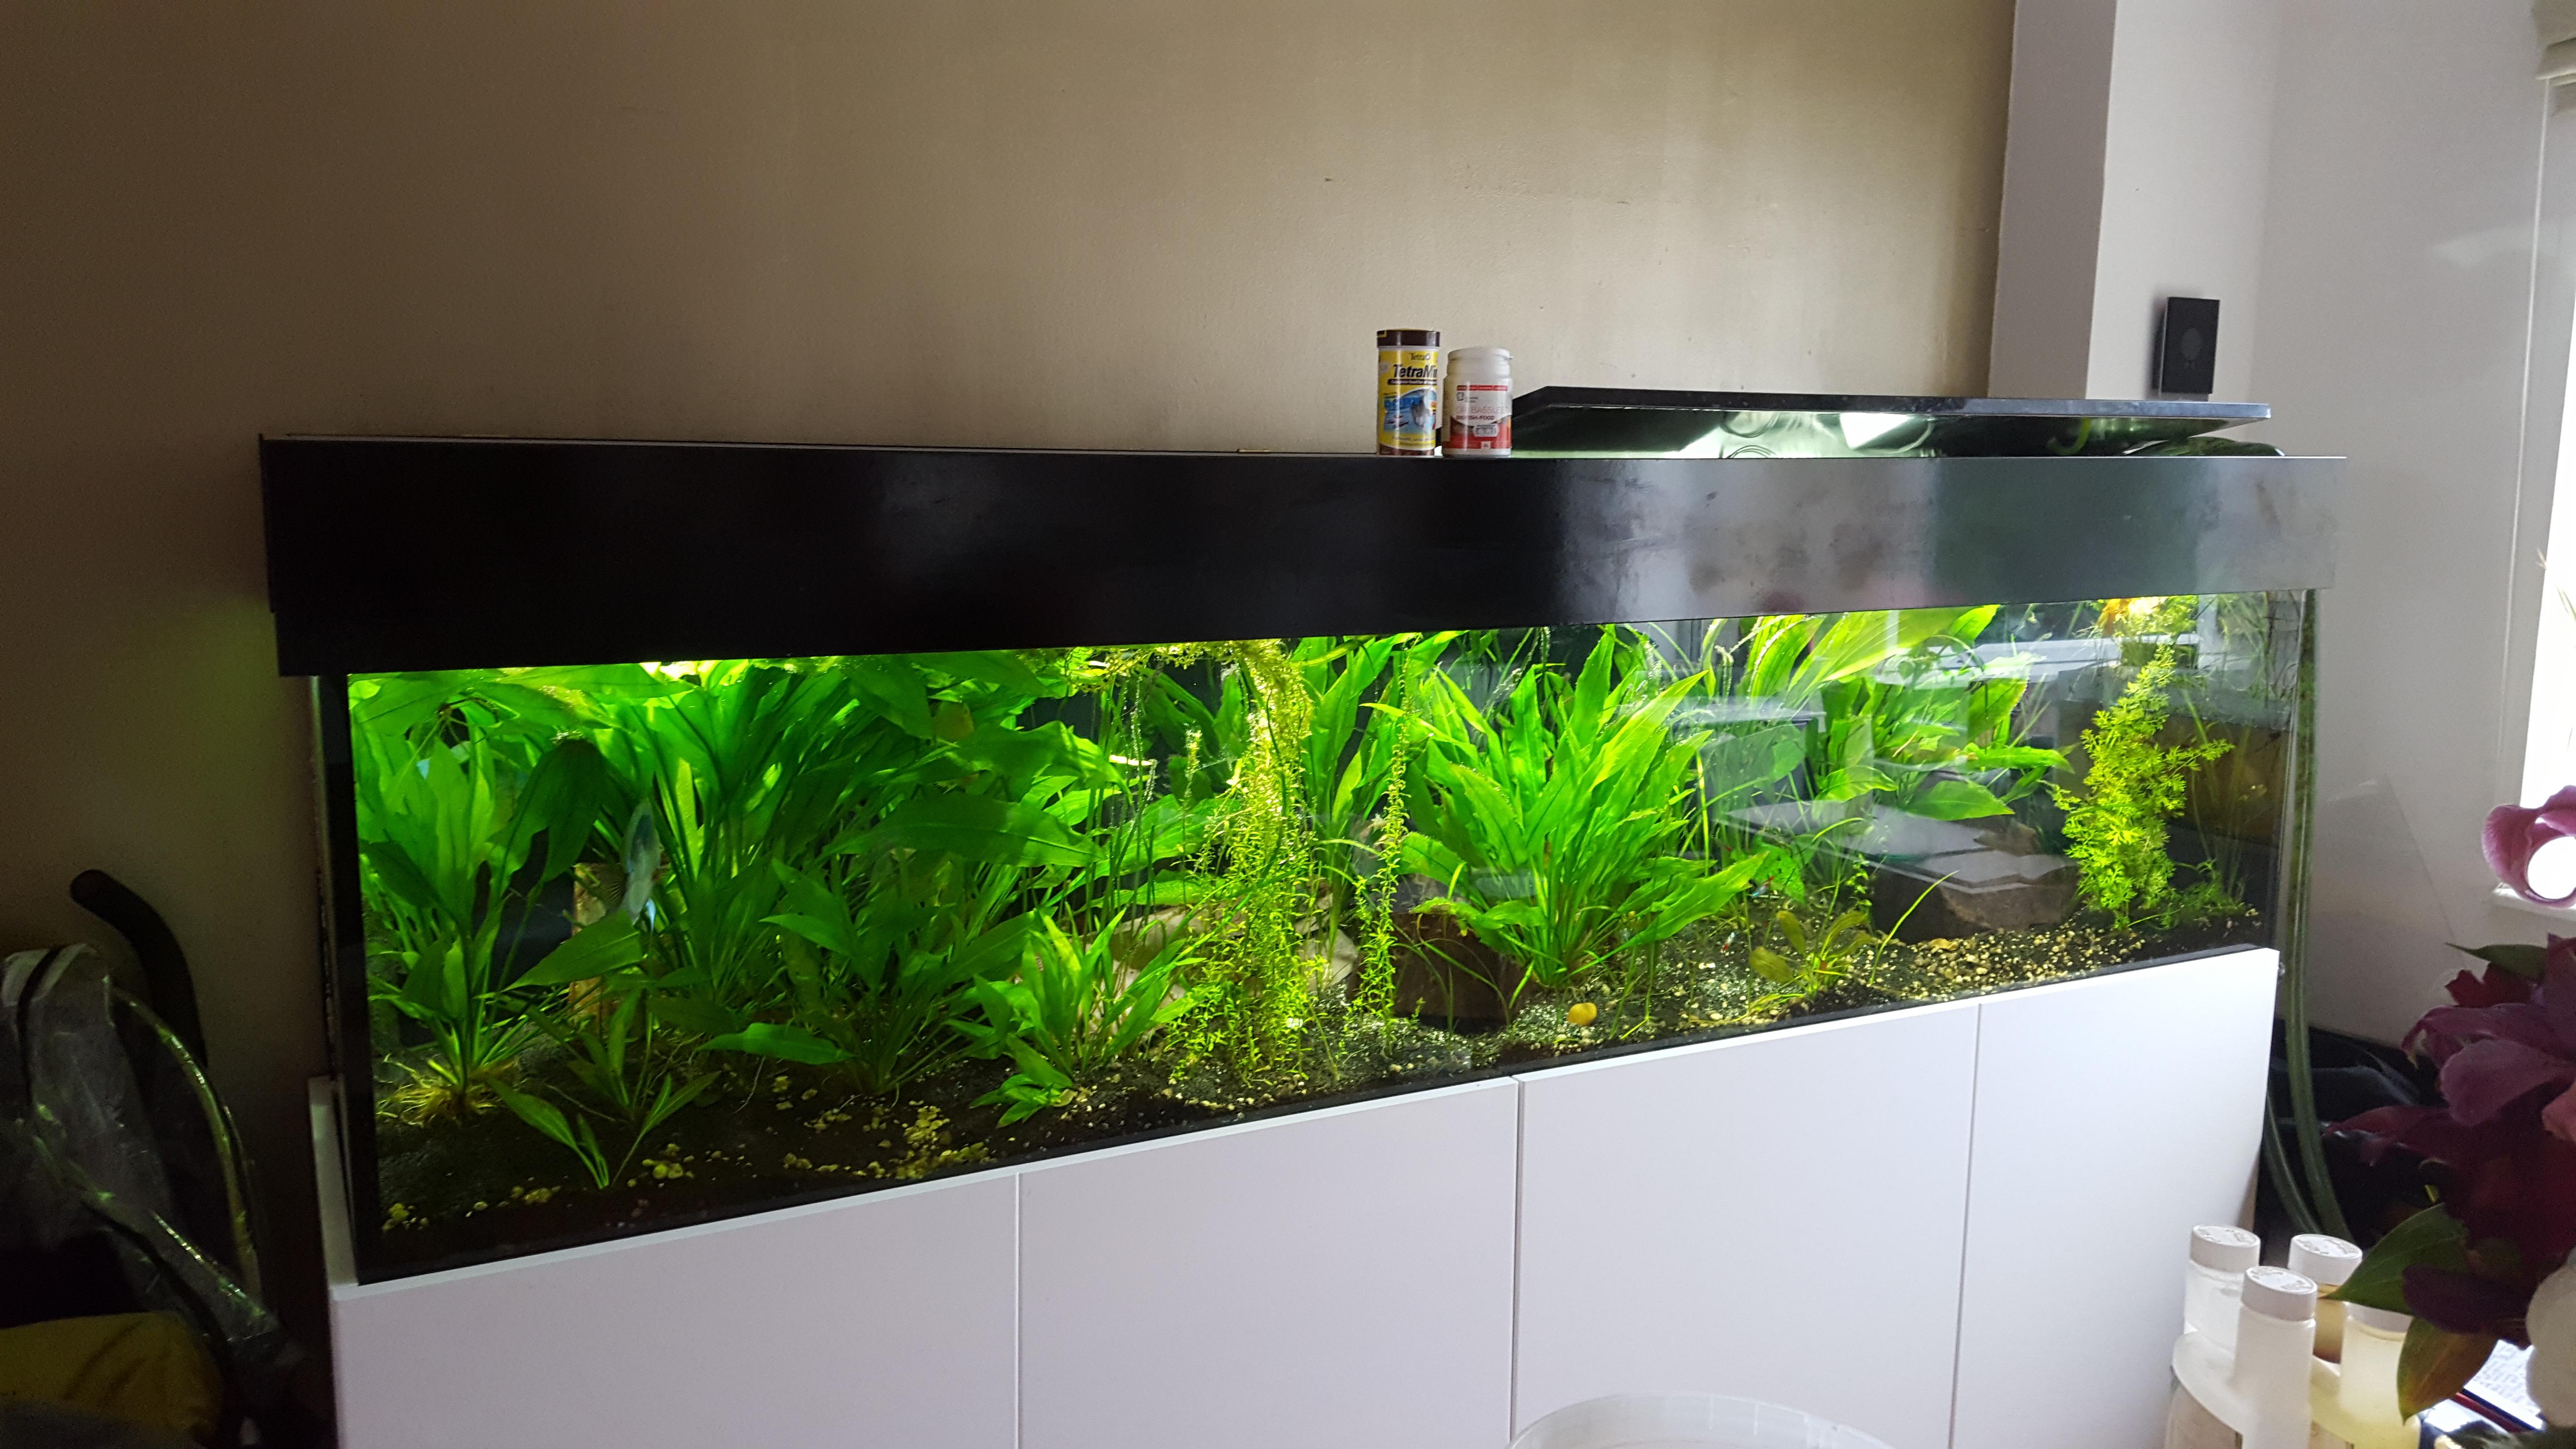 fish-tank1-jpg.jpg